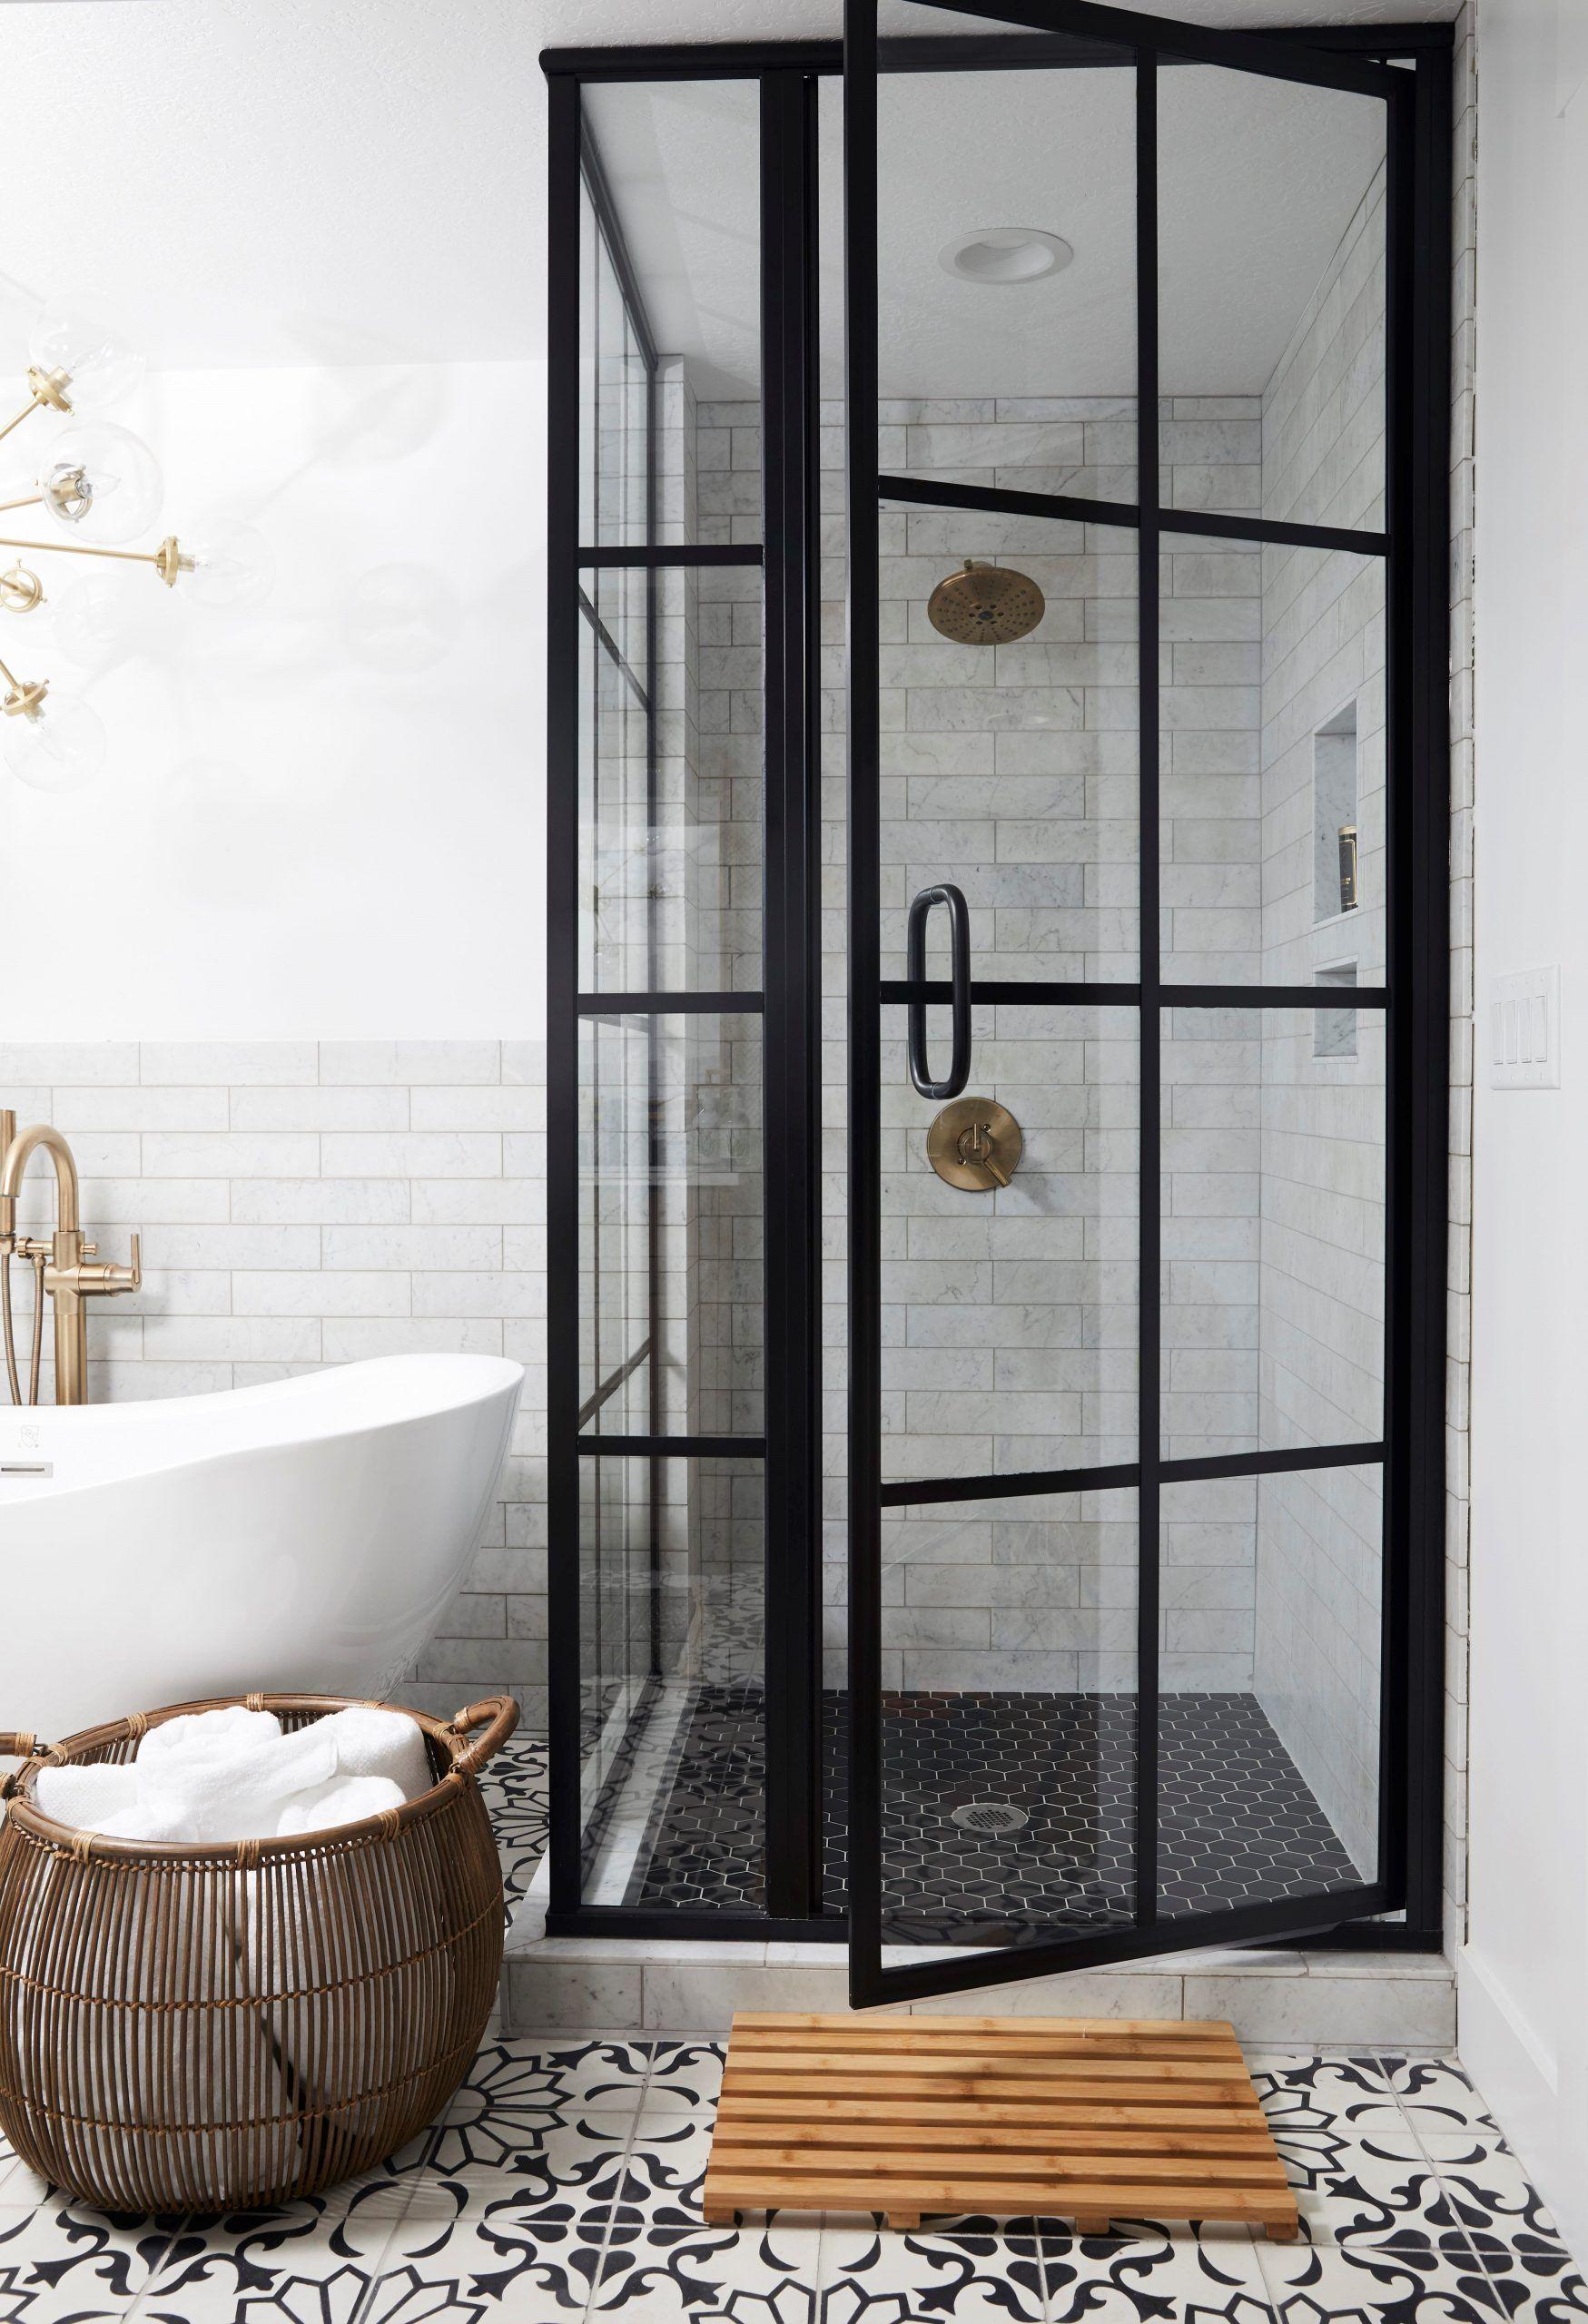 Modernes Mediterranes Badezimmer Badezimmer Mediterranes Modernes In 2020 Bauernhaus Badezimmer Badezimmer Badezimmer Hutte